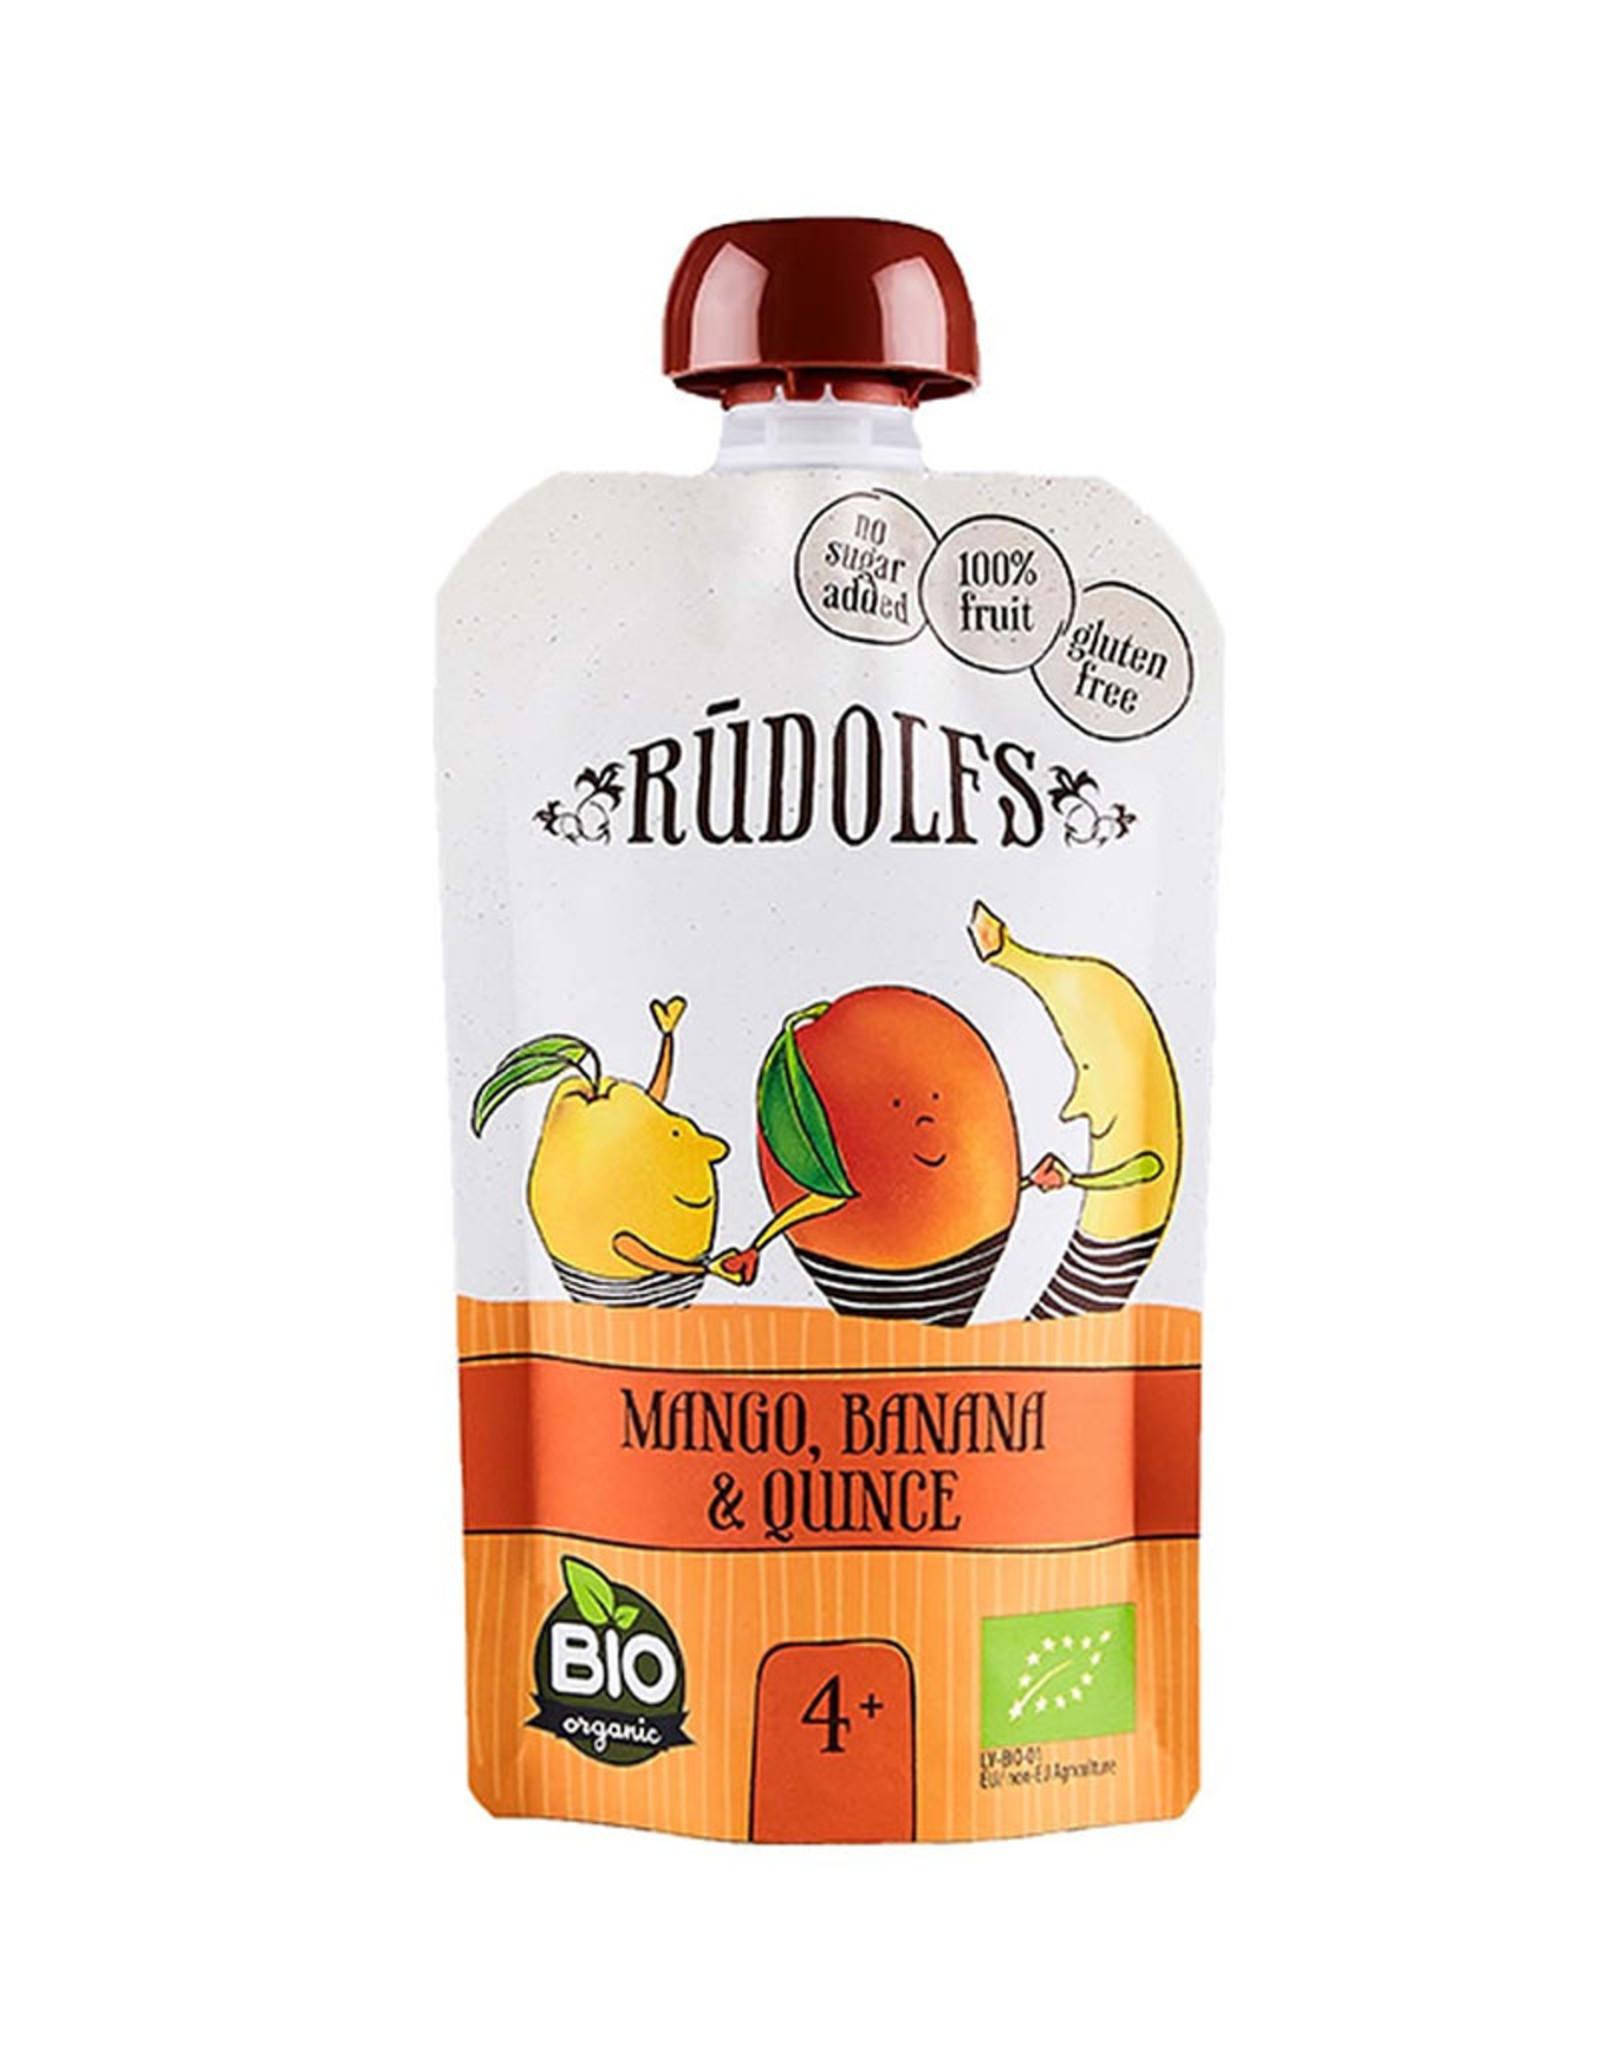 Rudolf's Bio Organics Rudolfs - Mango Banana Quince Puree (110g)